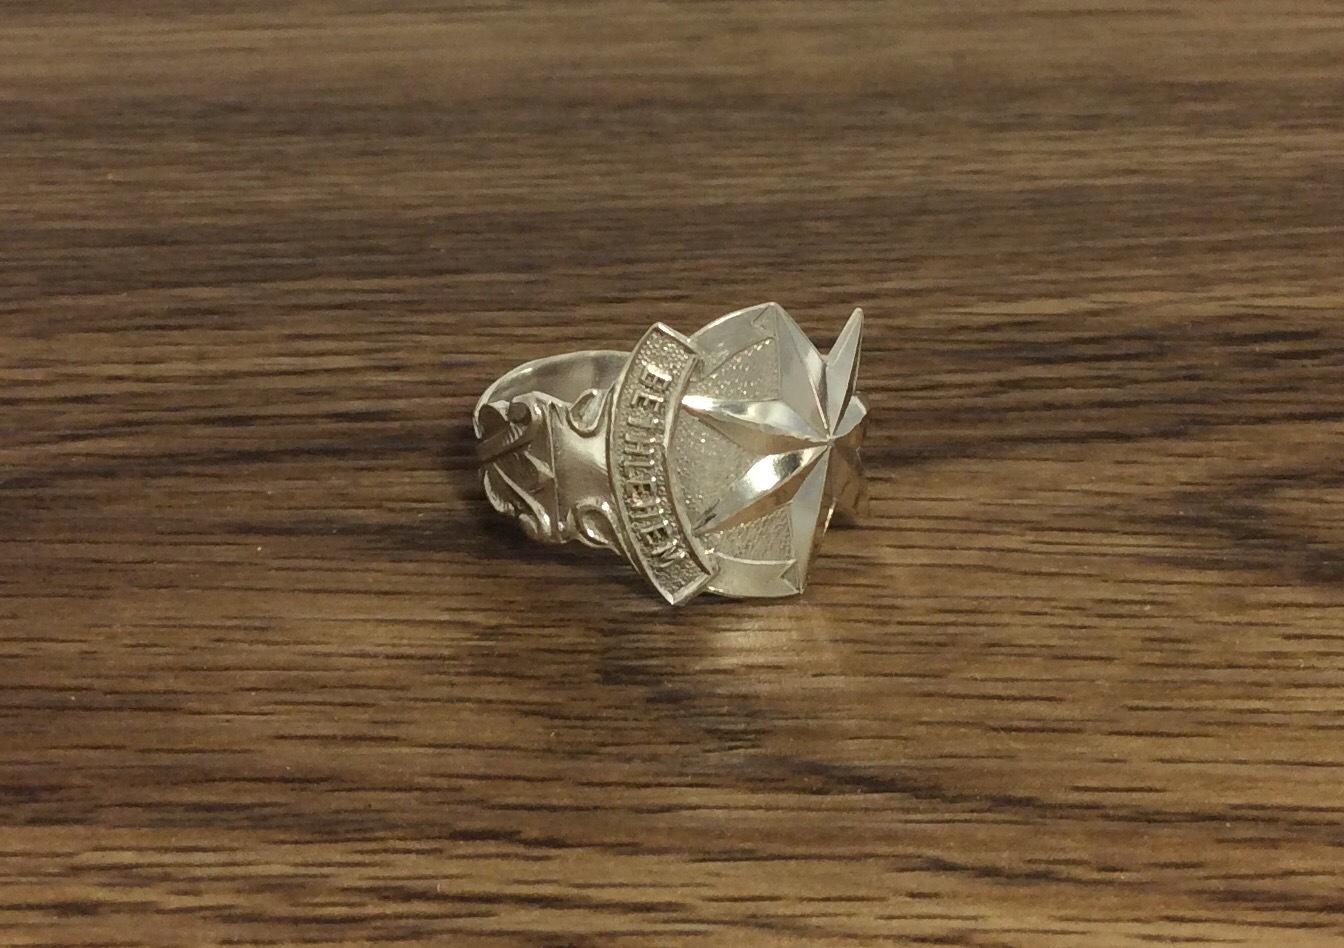 Vintage Sterling Silver Bethlehem Spoon Ring - Size Z